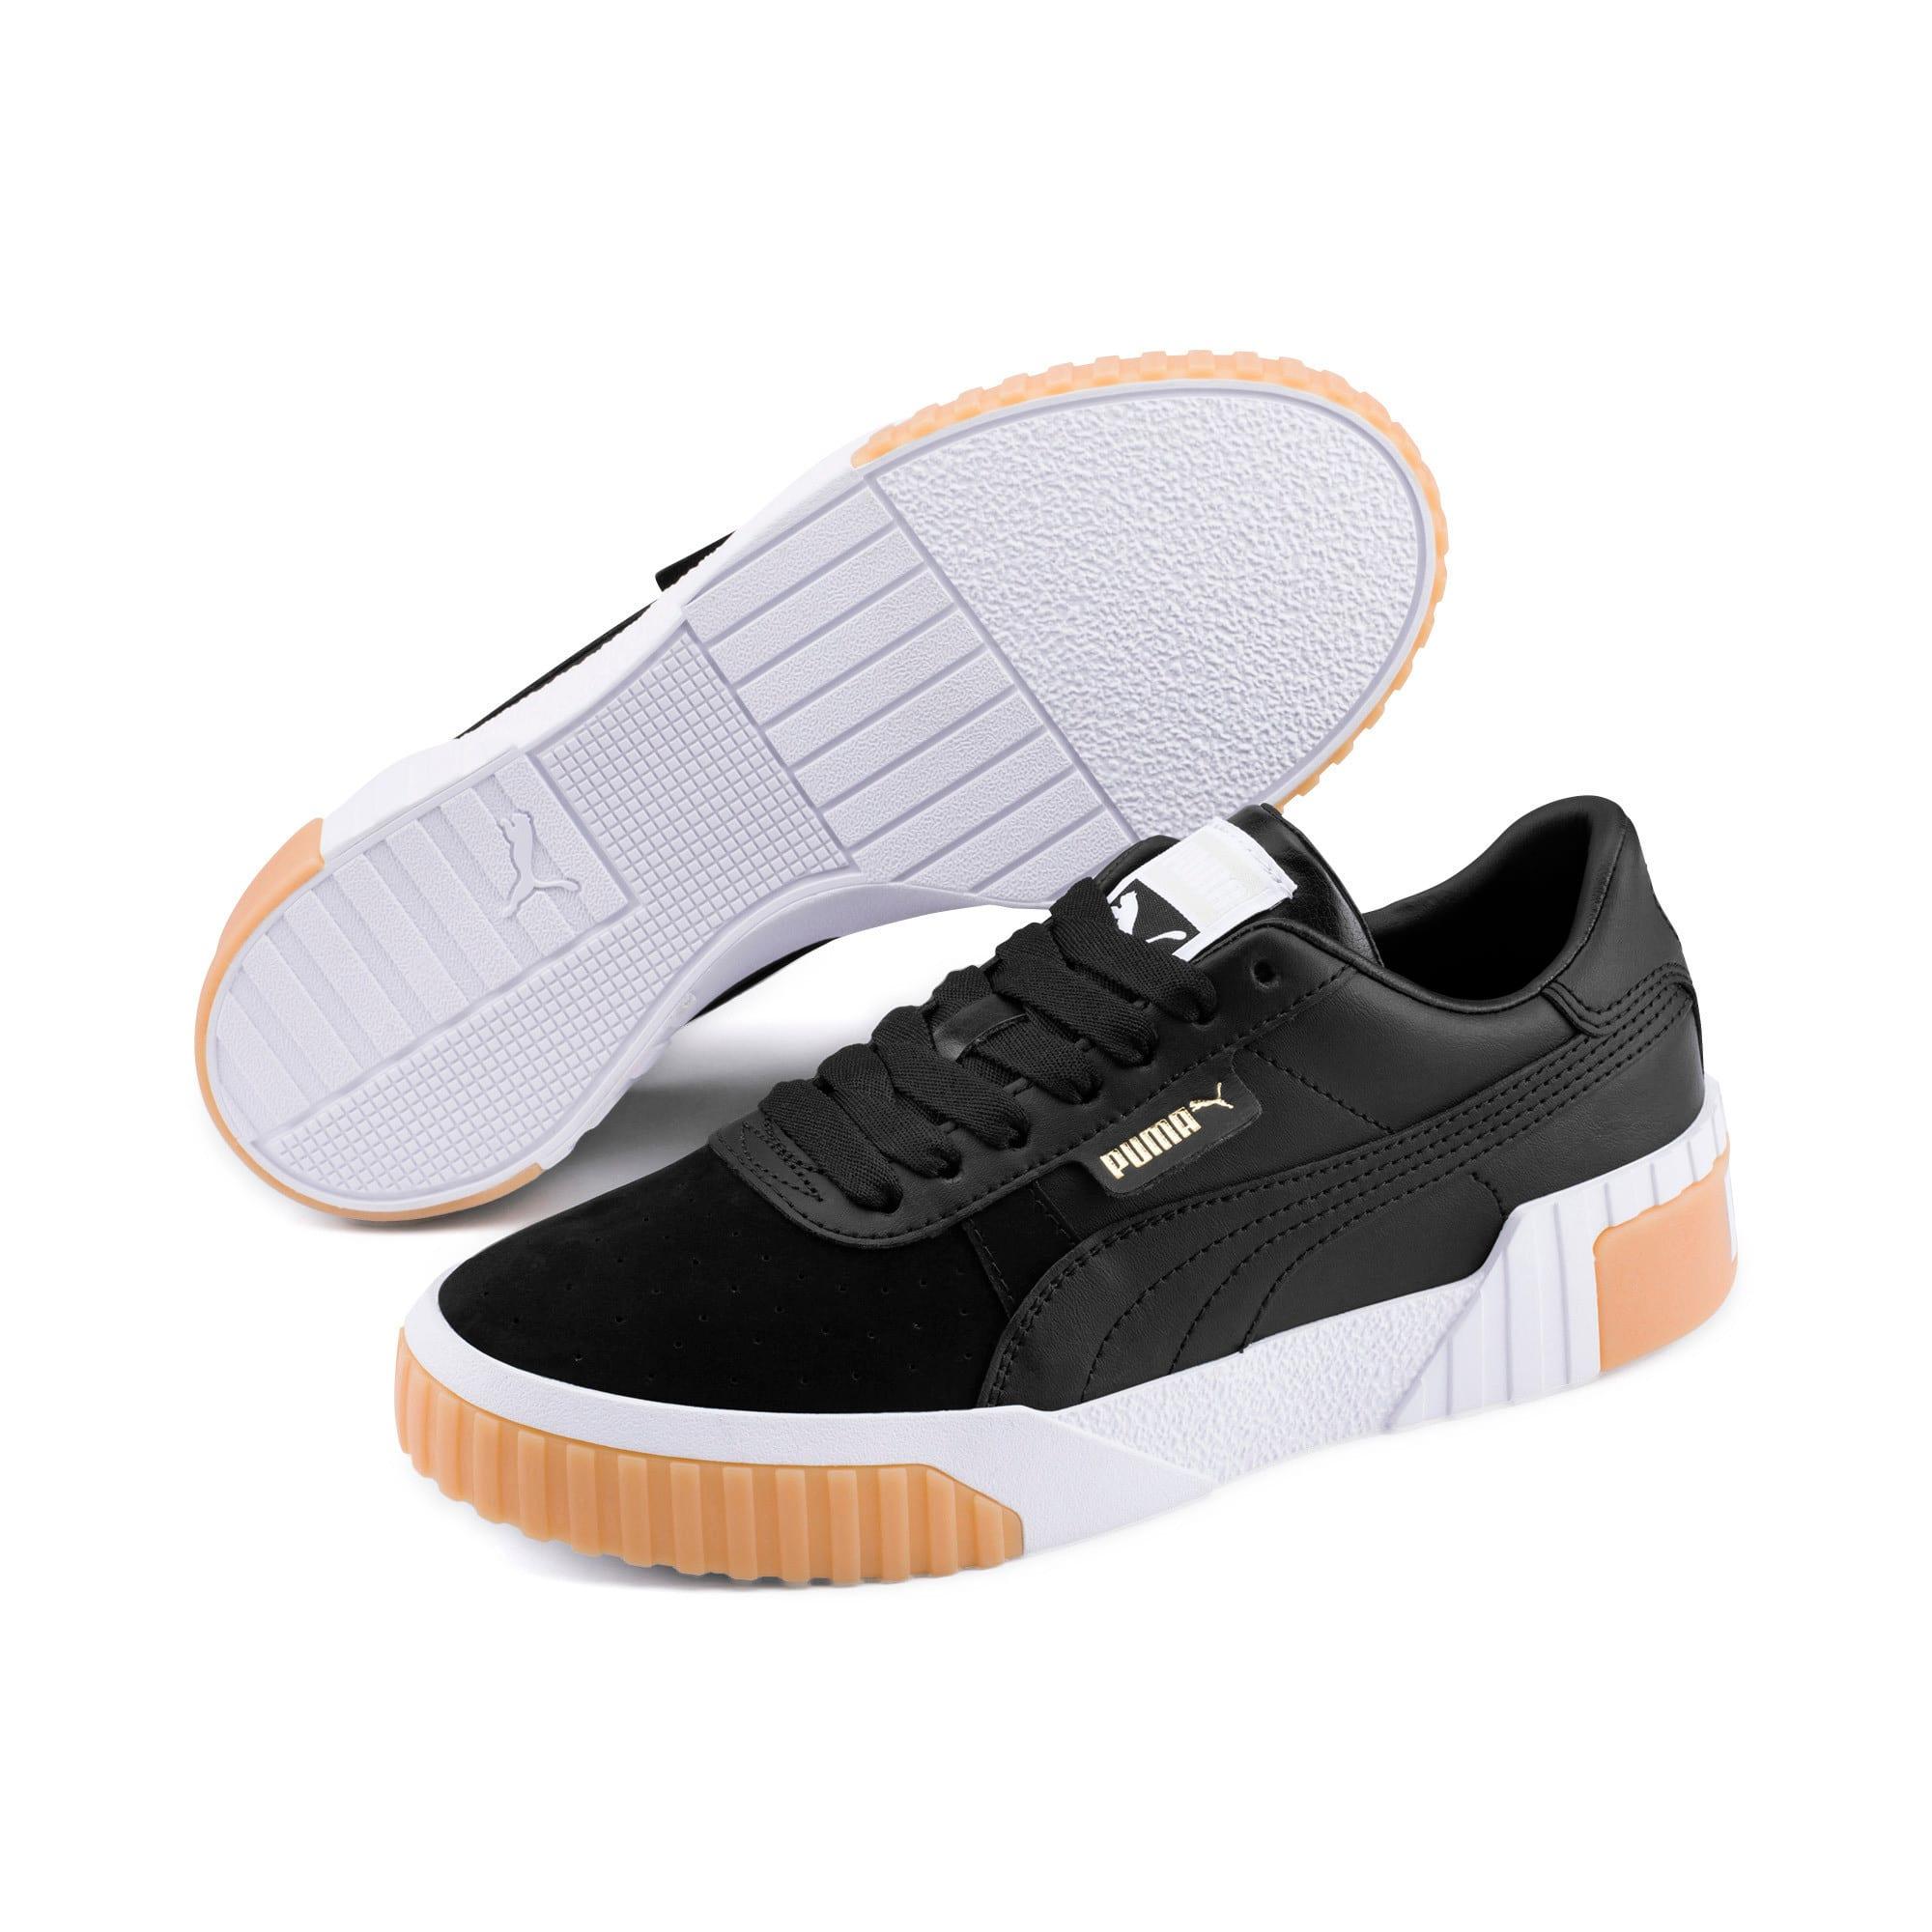 Thumbnail 2 of Cali Exotic Damen Sneaker, Puma Black-Puma Black, medium